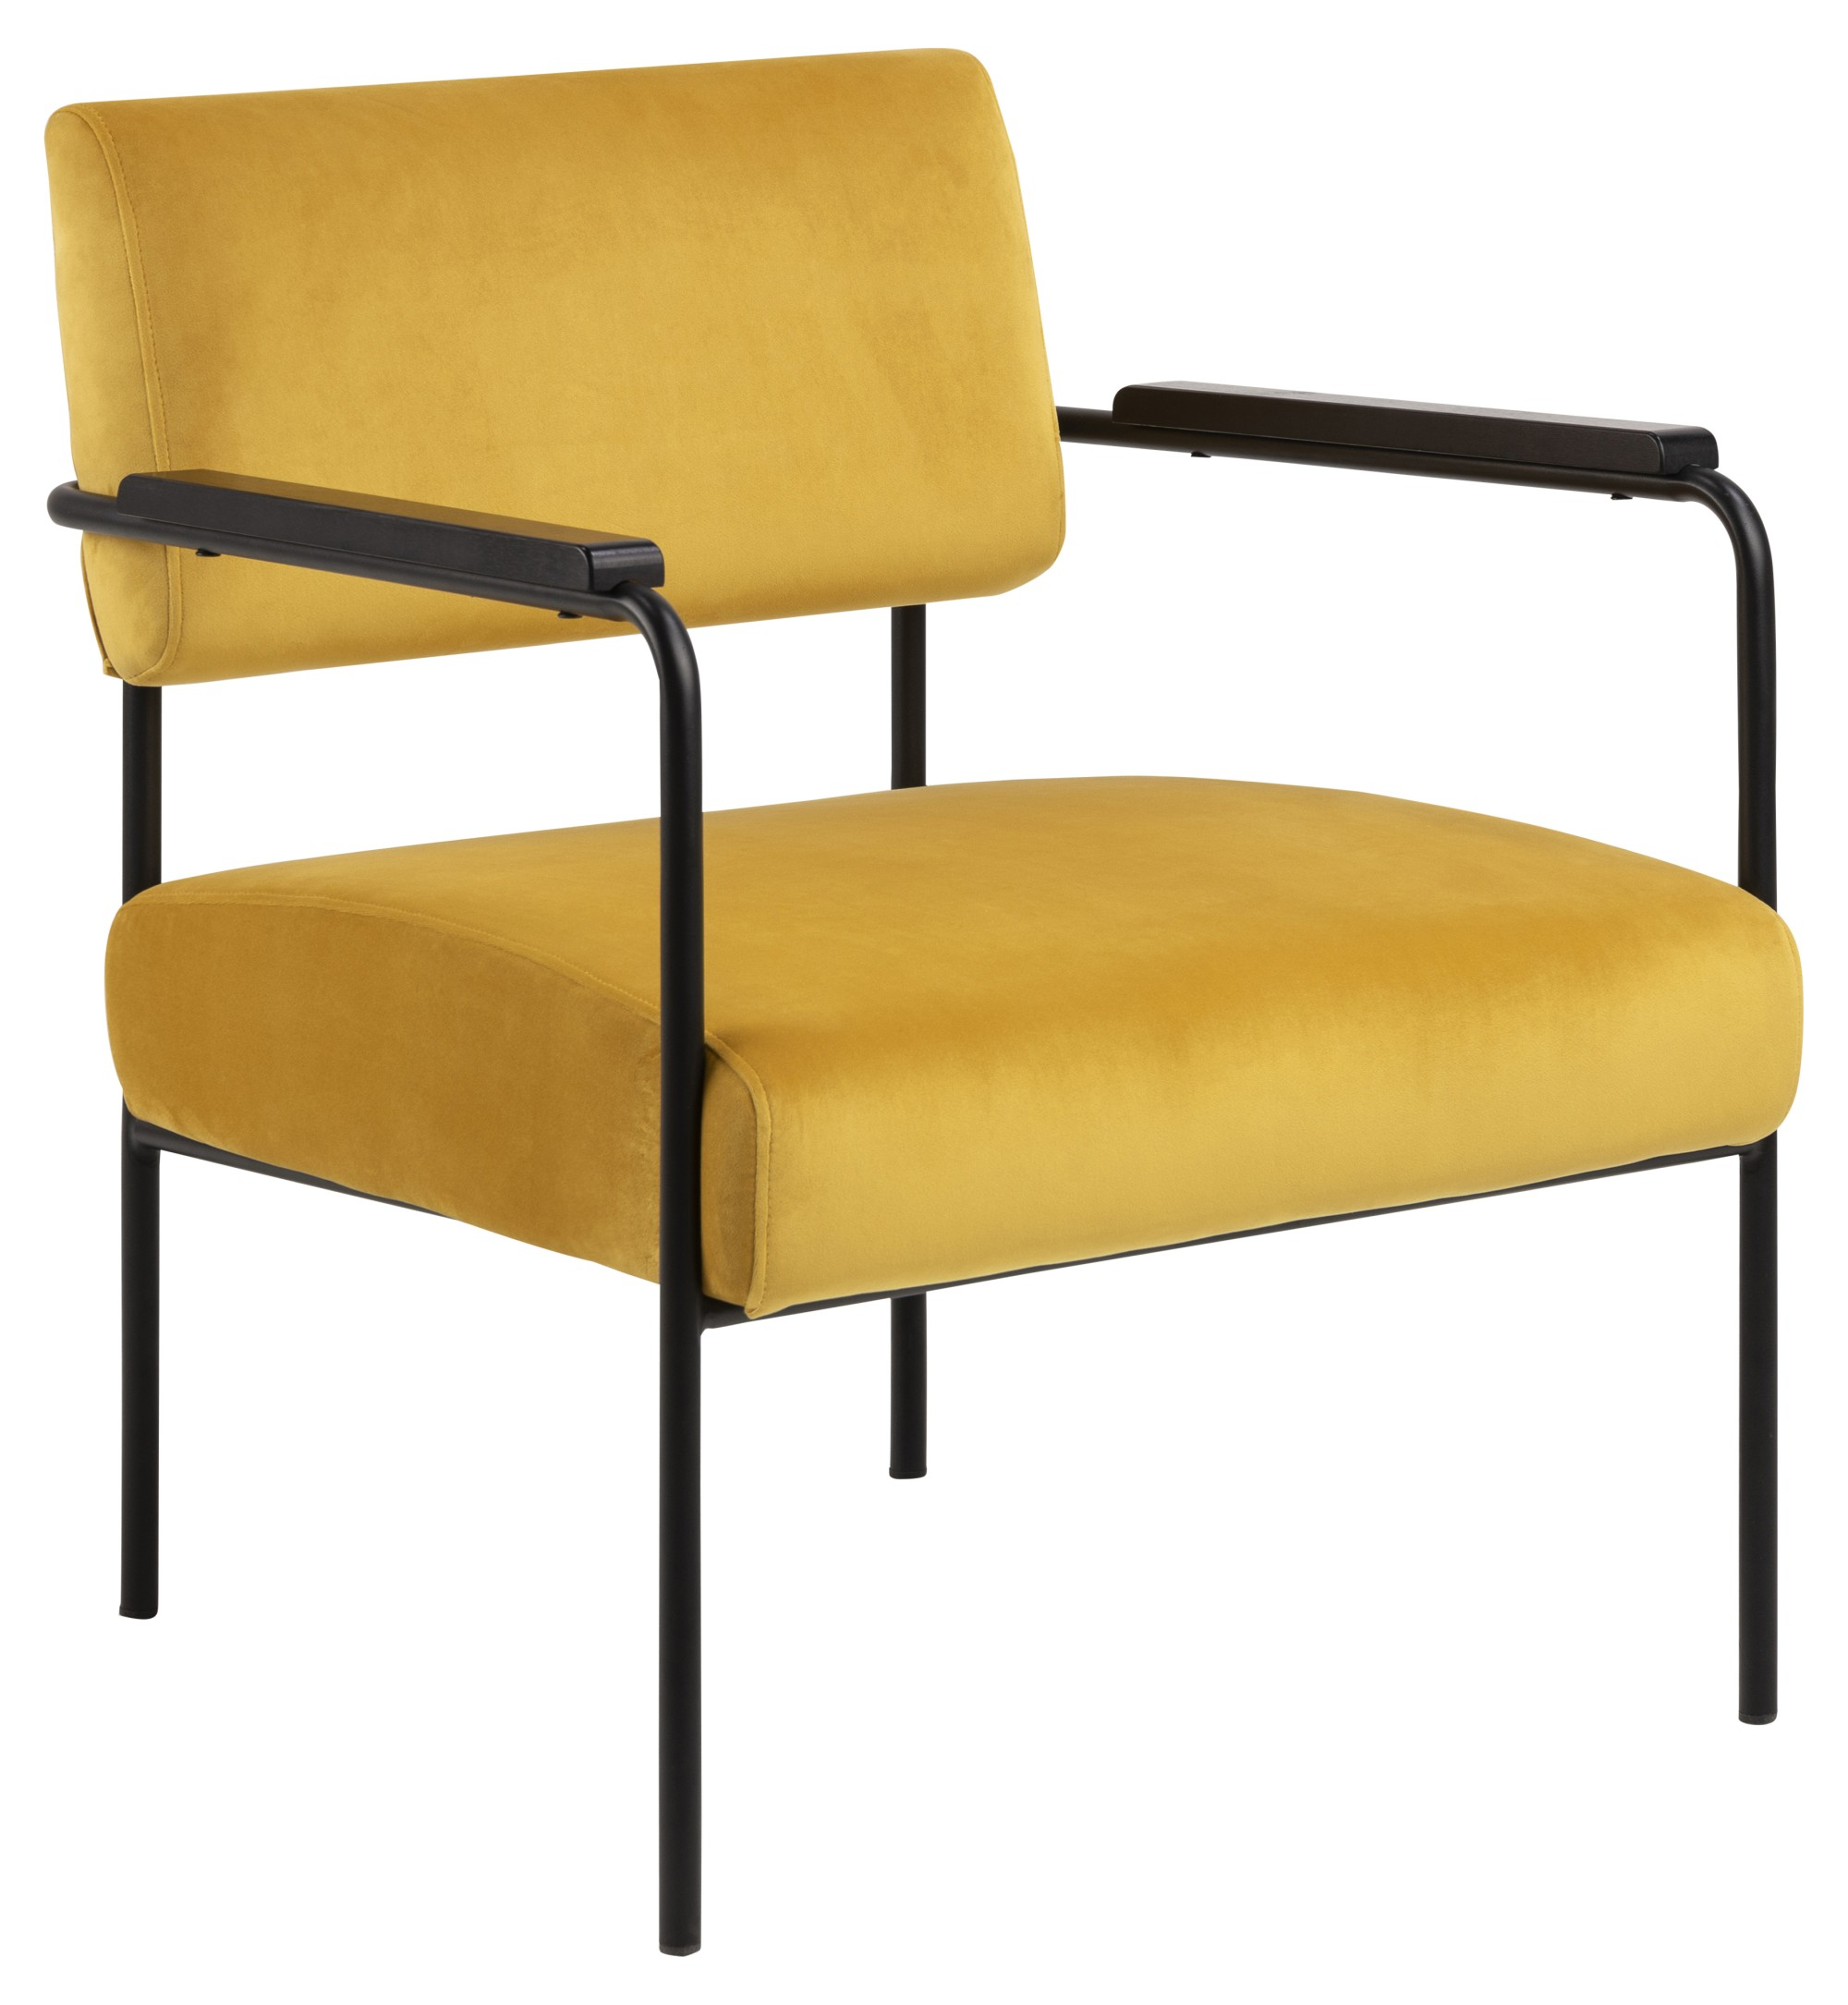 Clare Sessel Gelb Esszimmer Stuhl Wohnzimmer Clubsessel Cocktailsessel Lounge Dynamic 24 De